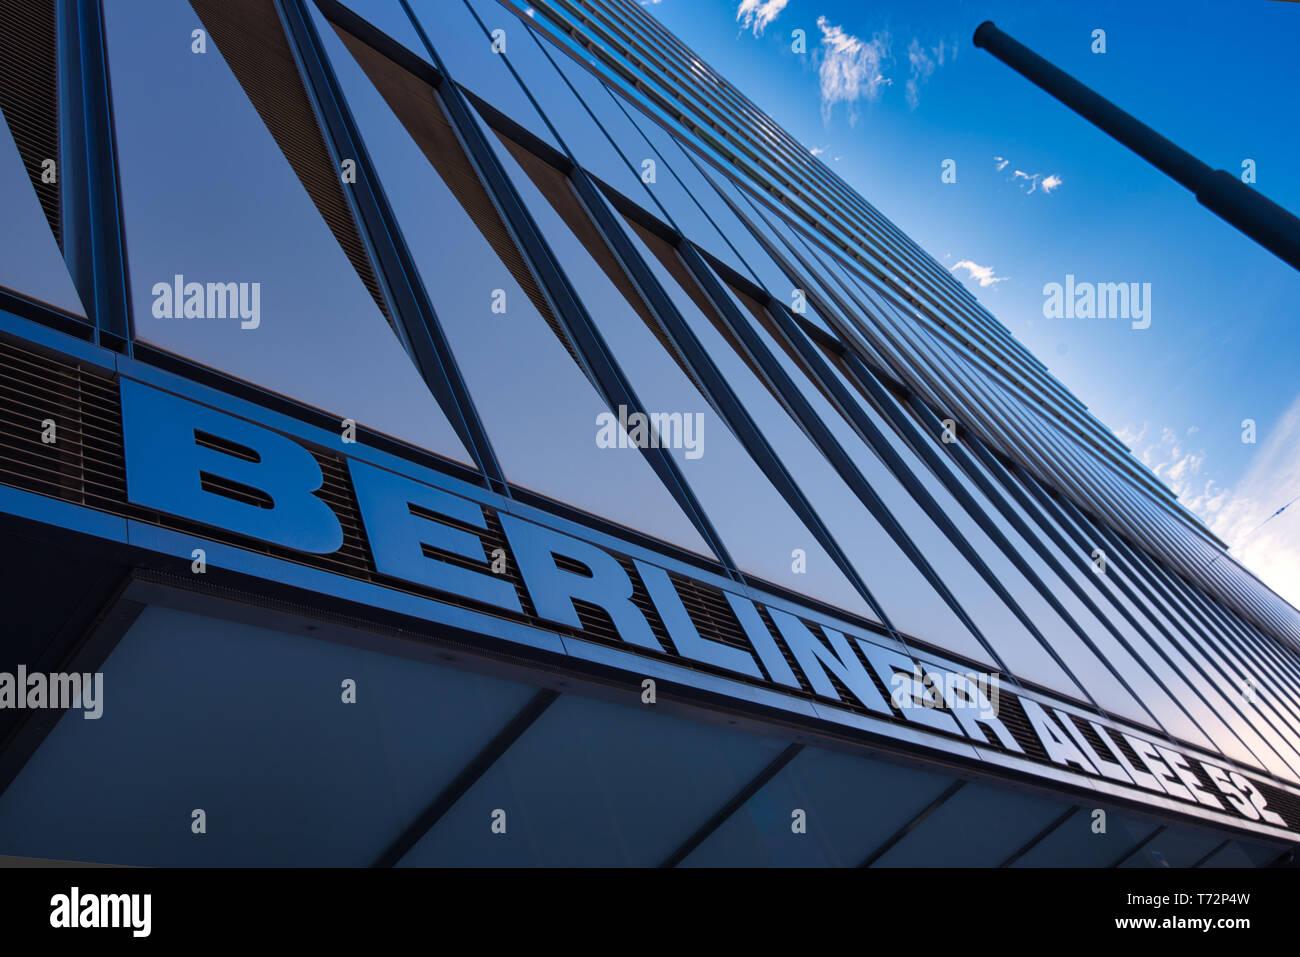 German Street Architecture - Berliner Allee - Stock Image